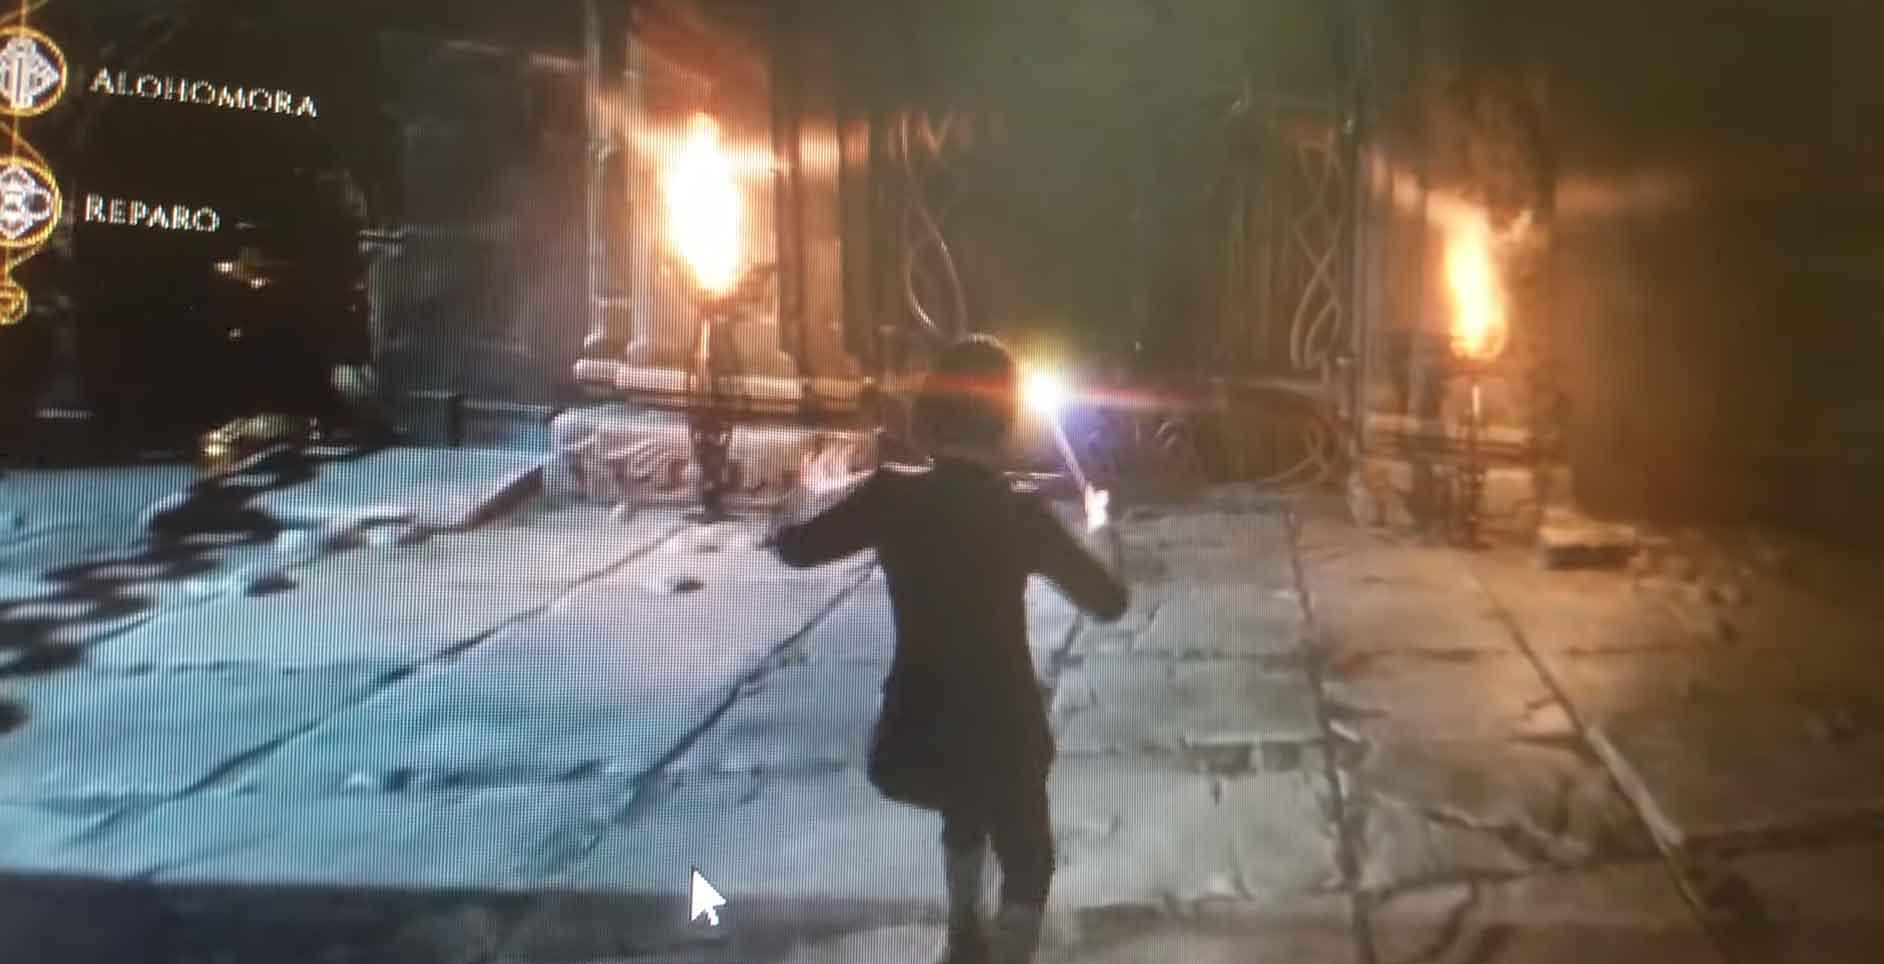 Harry-Potter-Wizarding-World-Game-Leak-Rocksteady